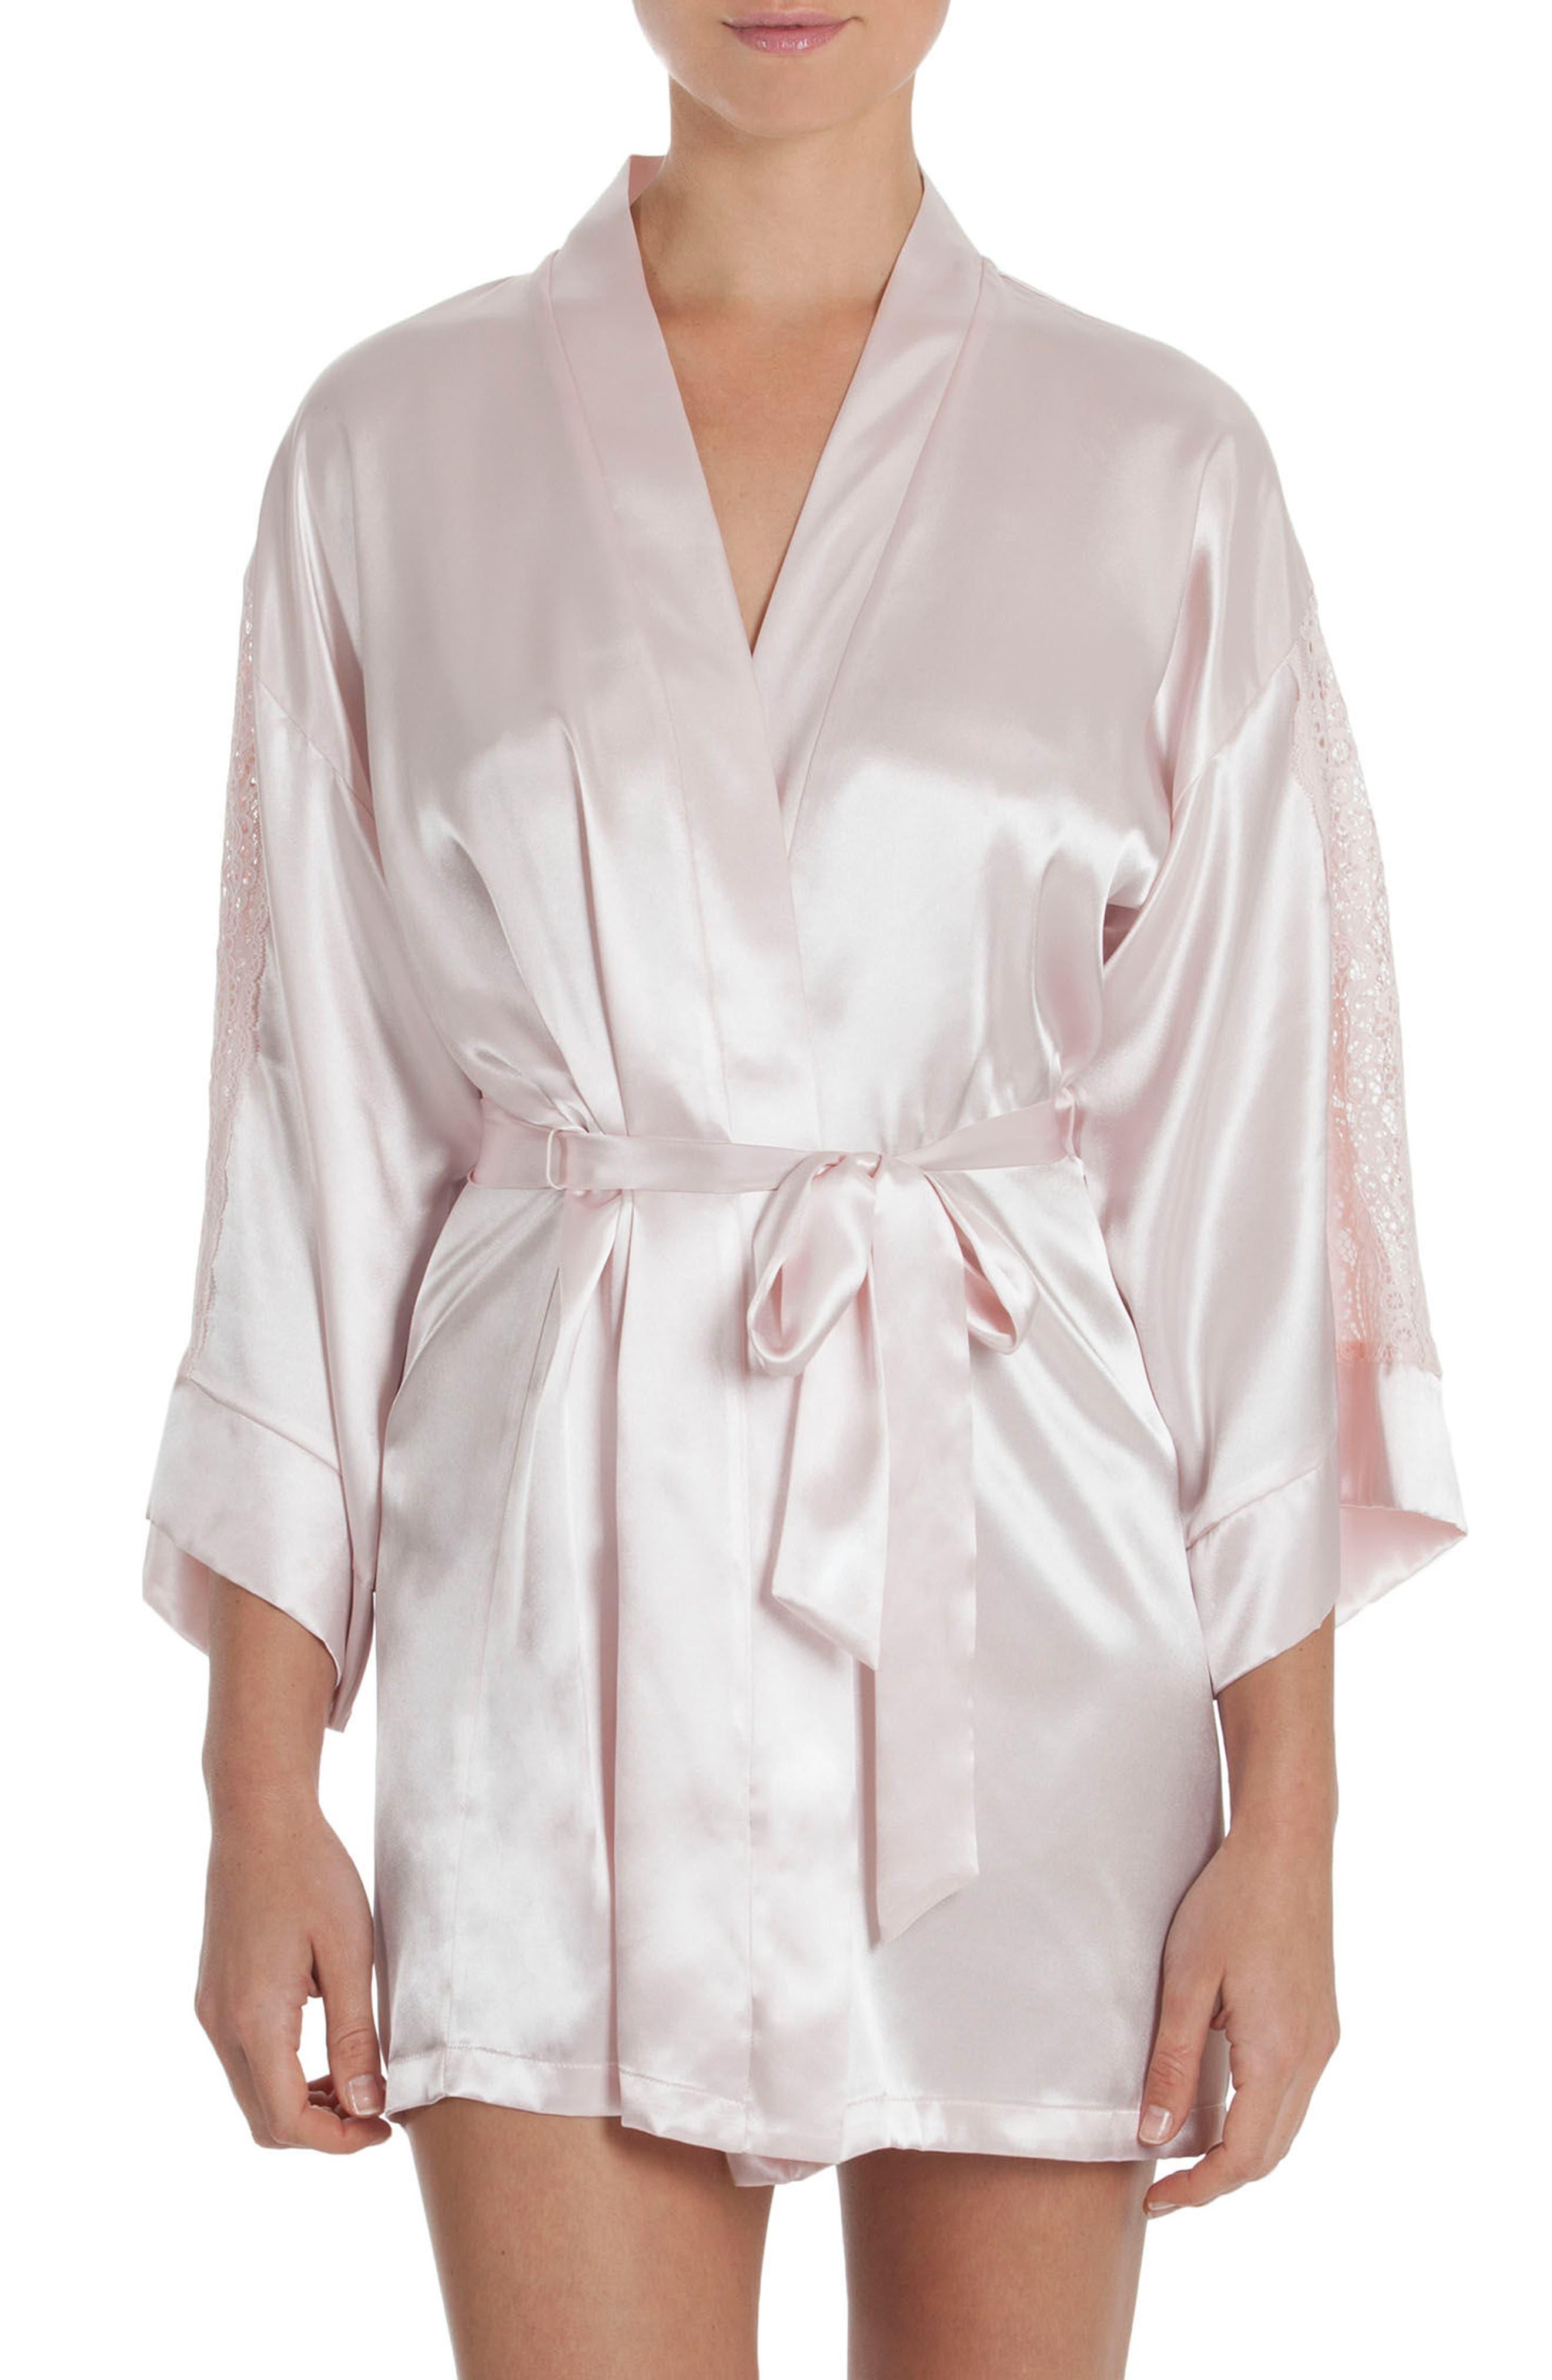 Dress White Satin Sleepwear